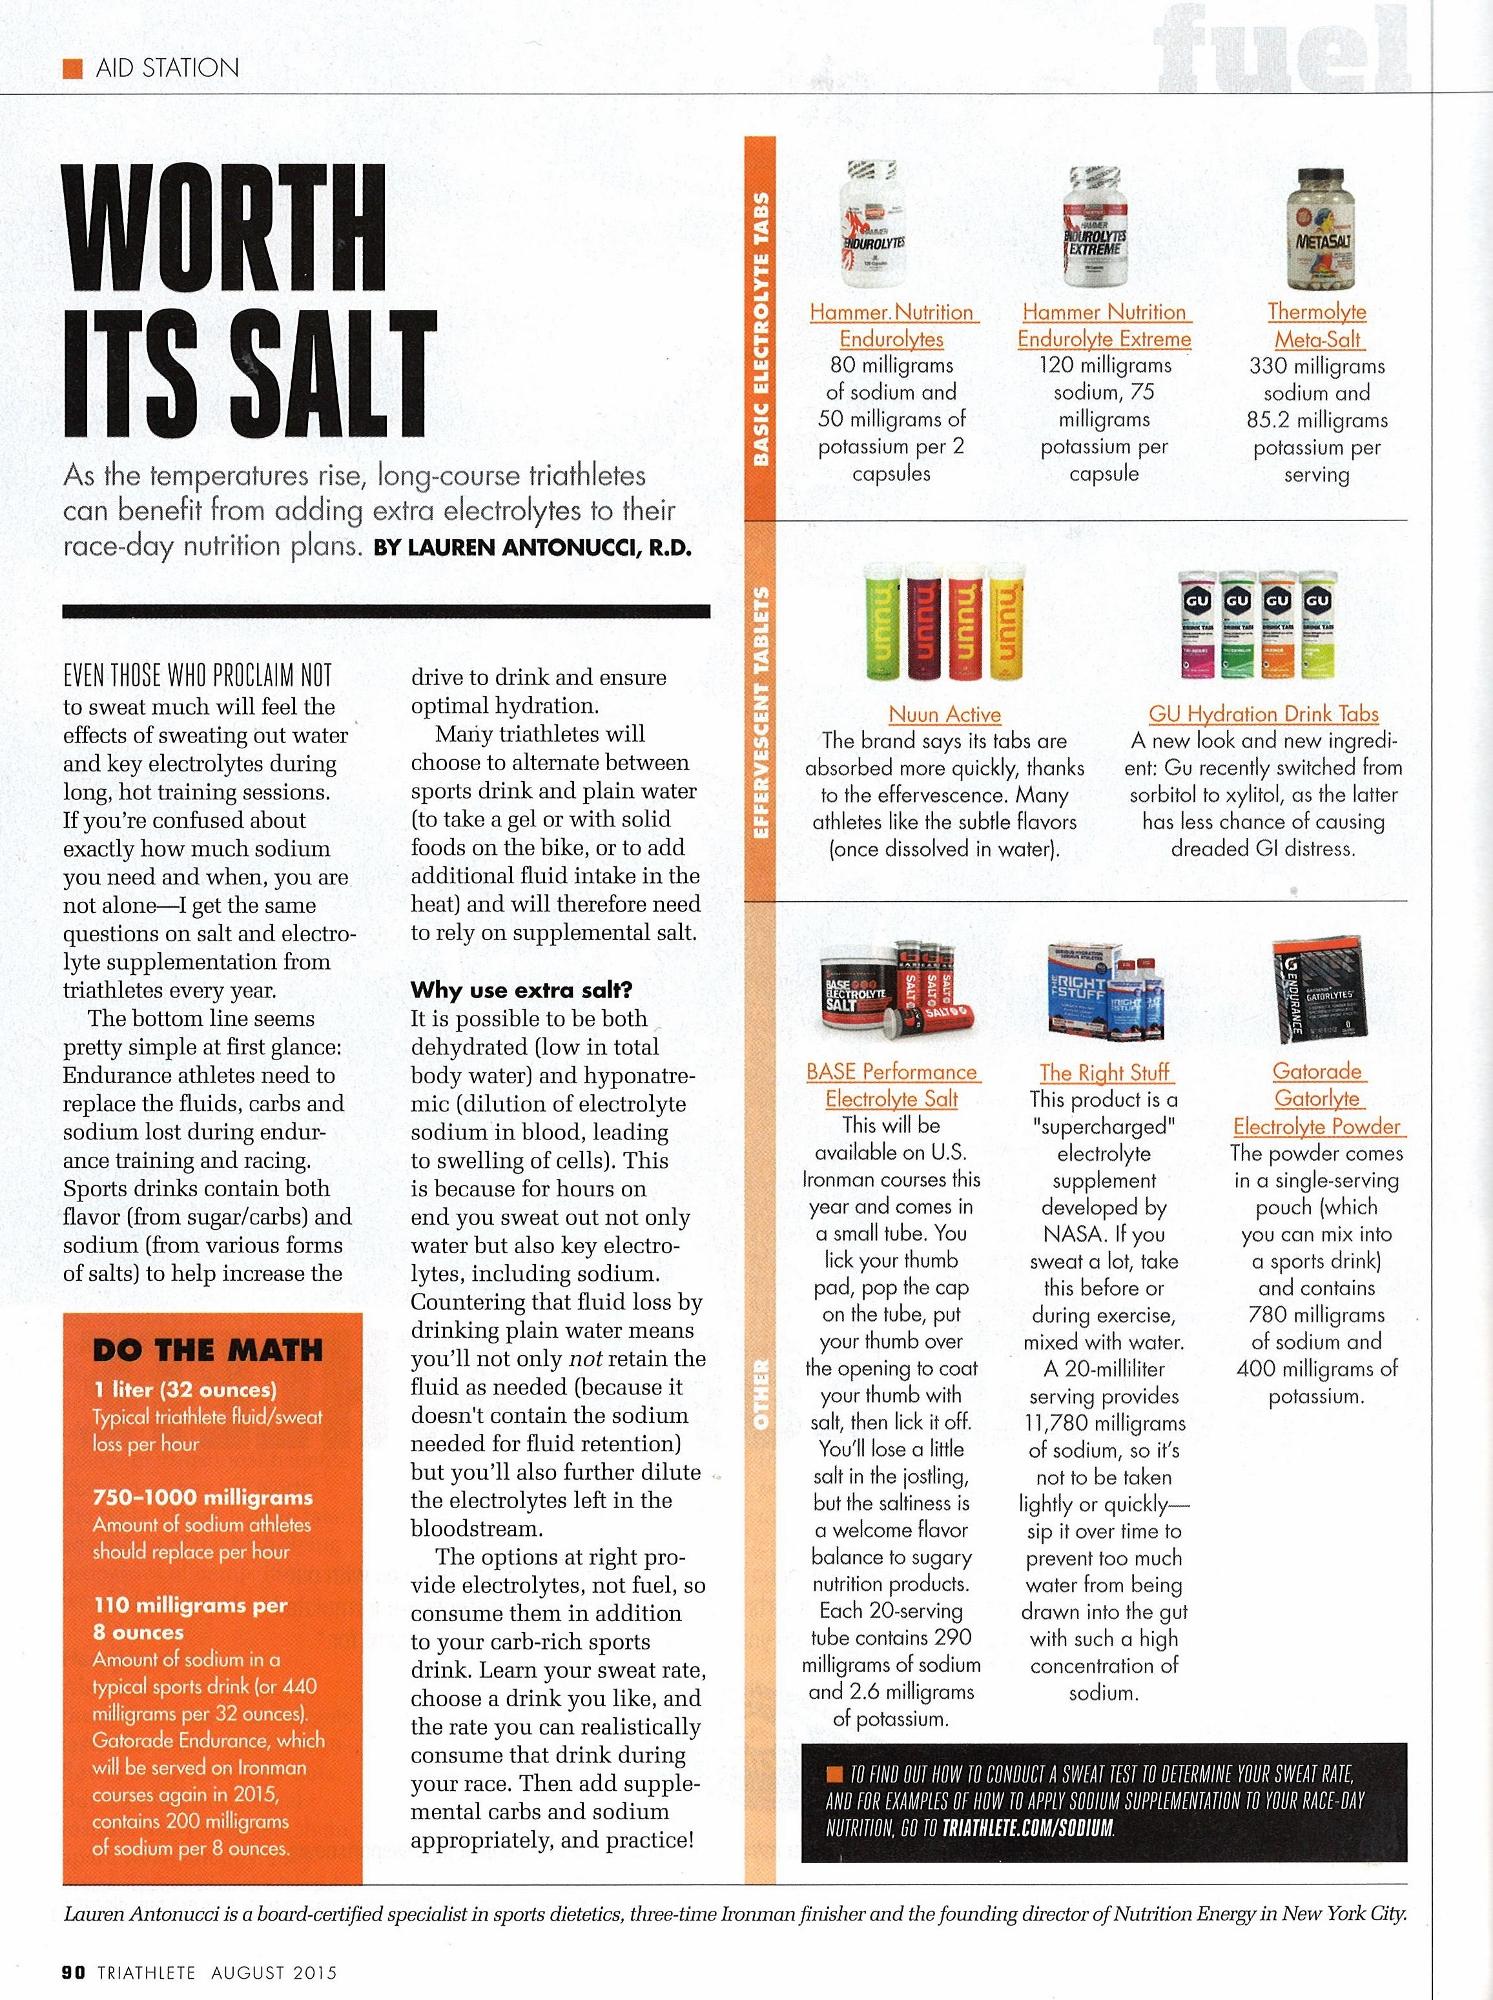 triathlete magazine special hydratation